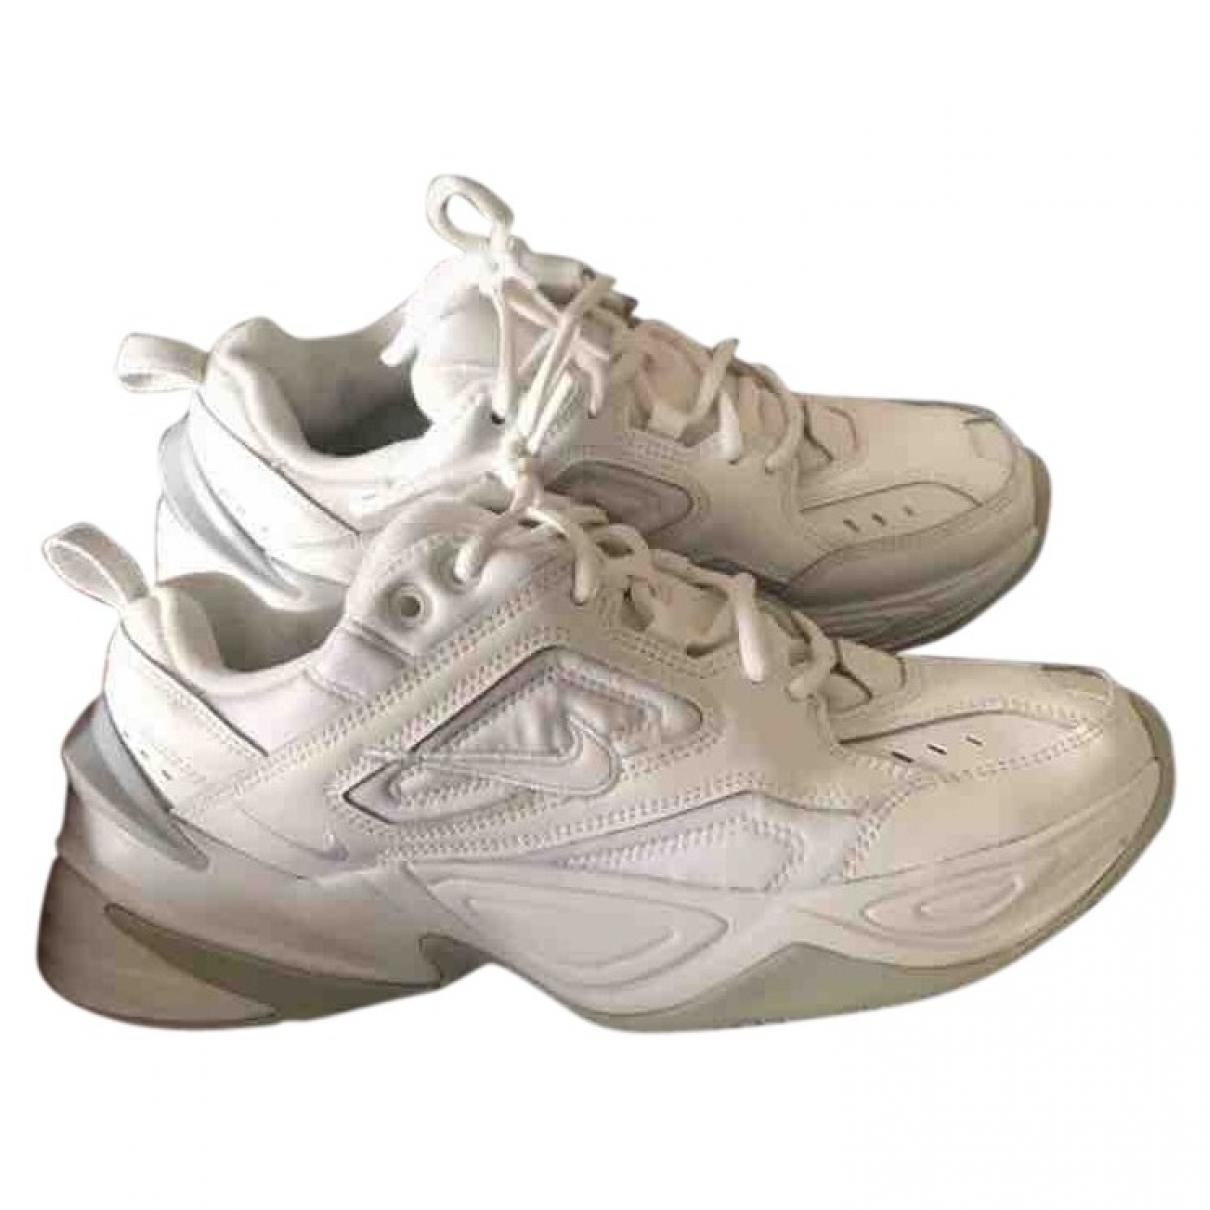 Nike M2K Tekno White Leather Trainers for Men 41 EU